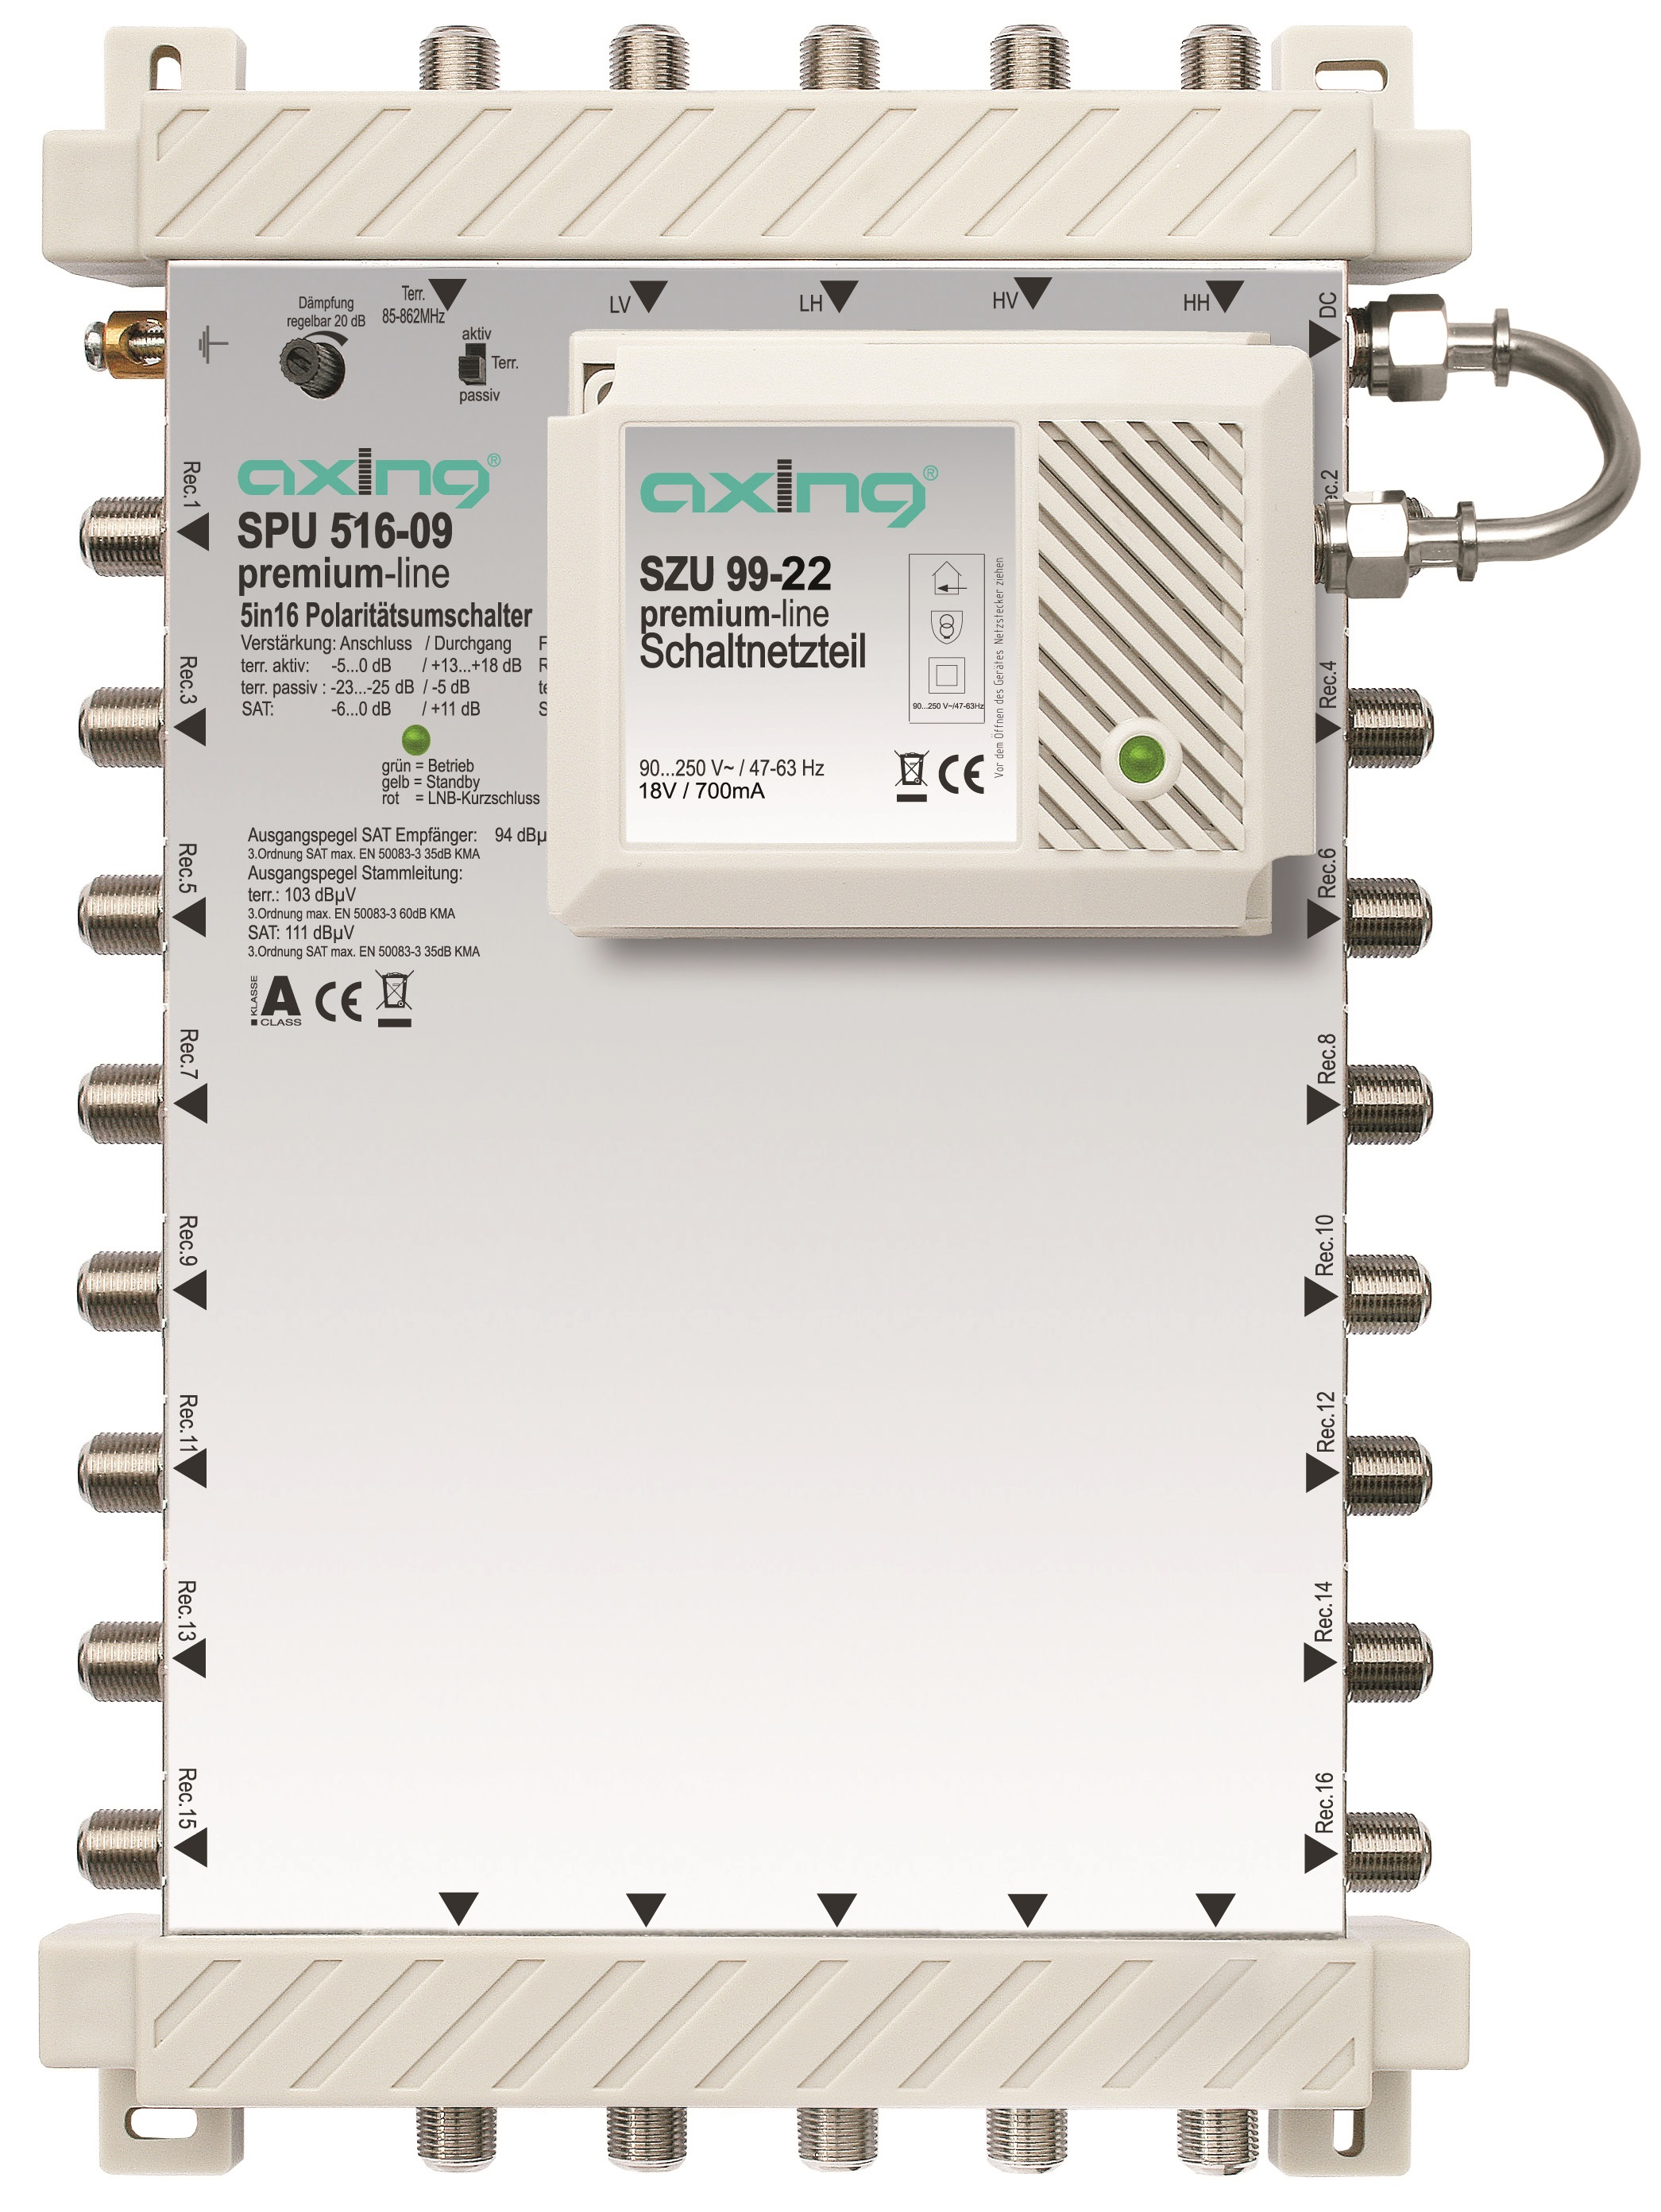 1 Stk SAT Multischalter  5 in 16, kaskadierbar, SPU 516-09 HSATS516KA